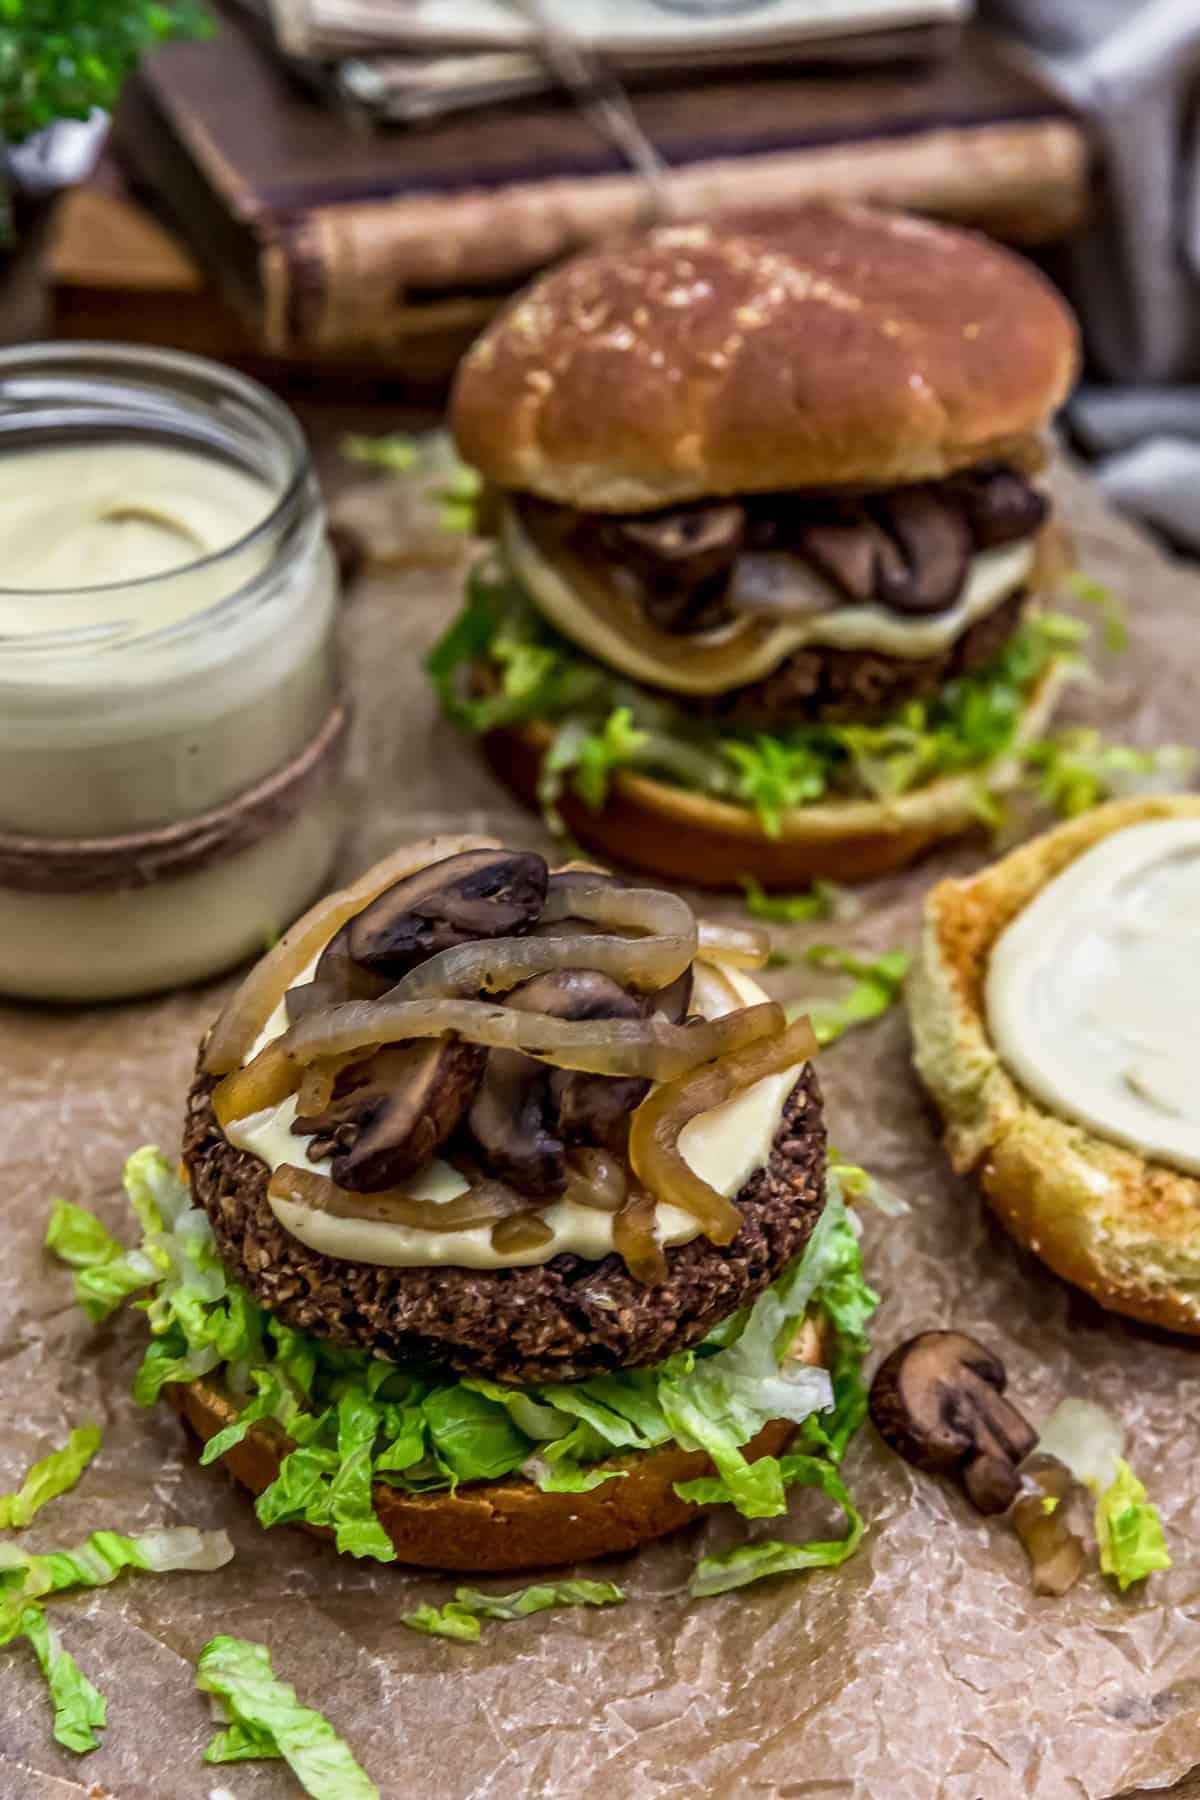 Tablescape of Vegan Patty Melt Burger